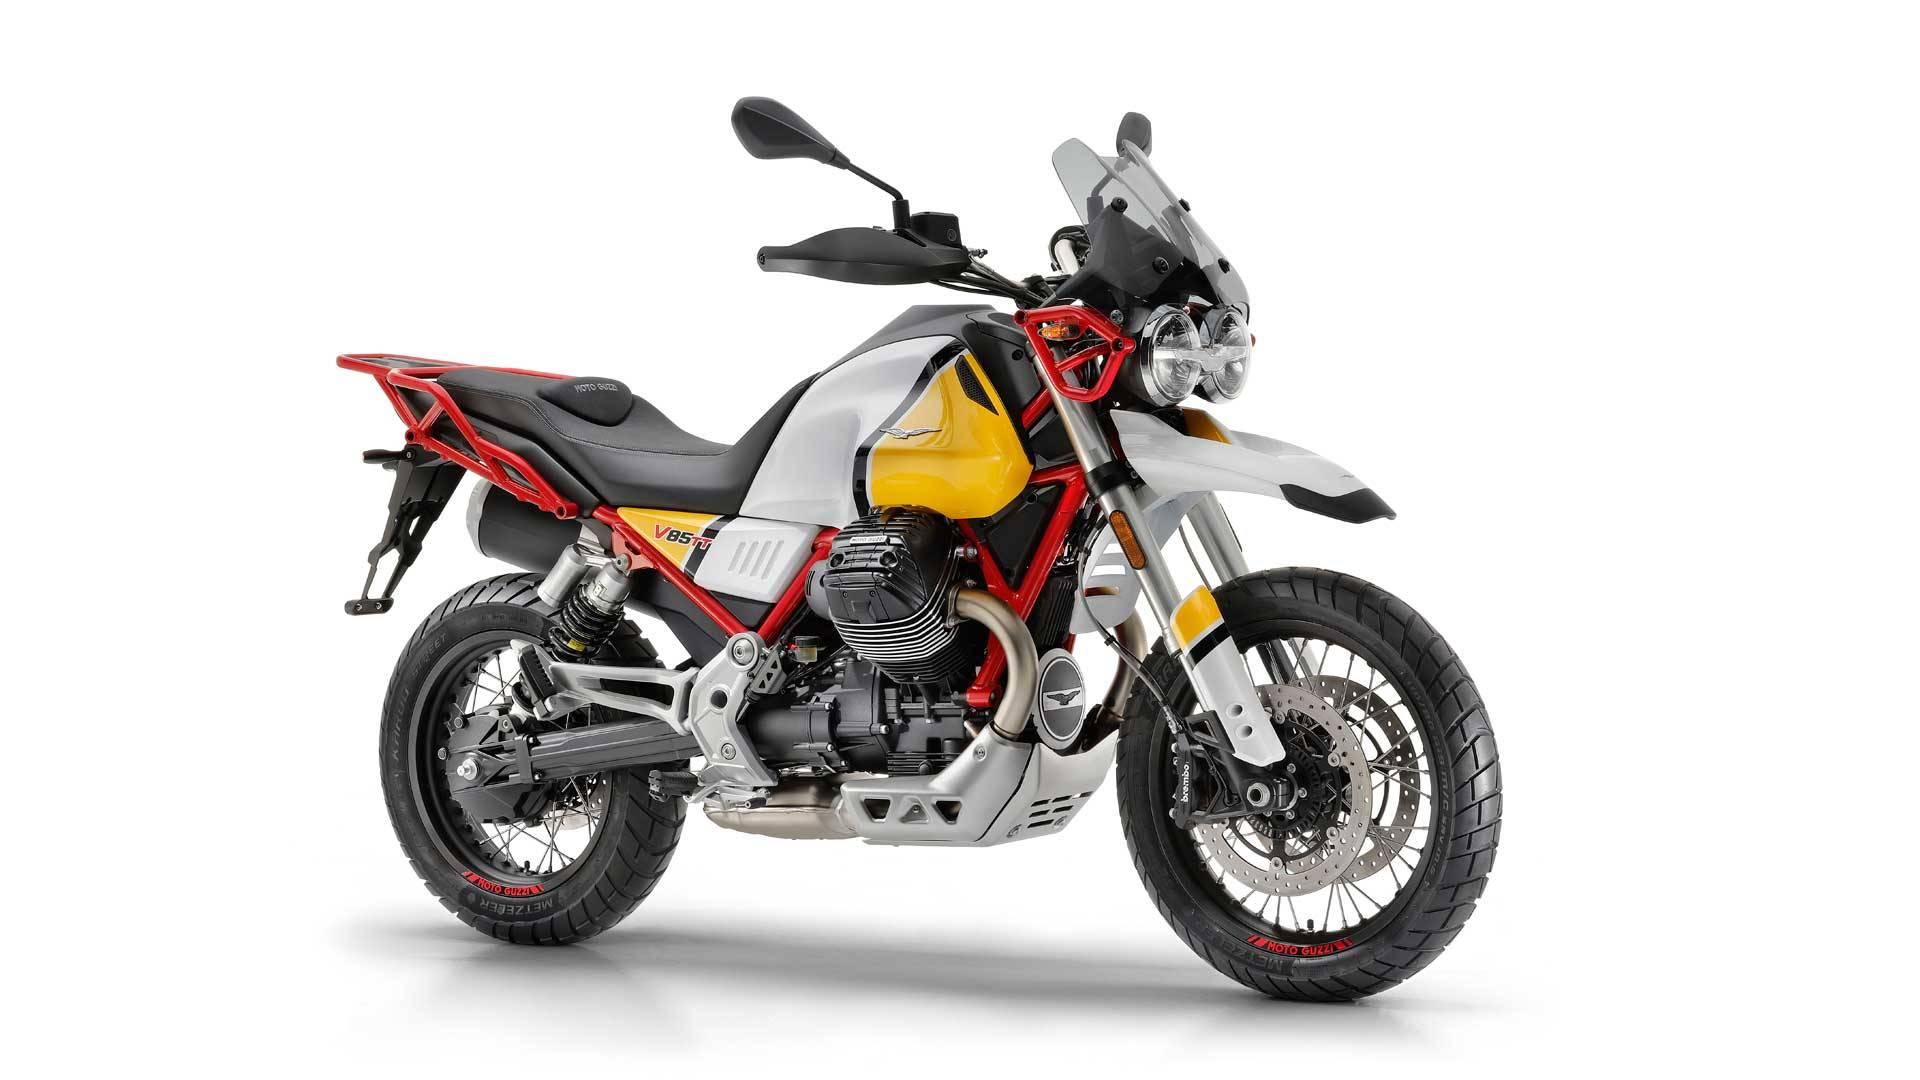 2019 moto guzzi v85 tt price revealed in america bikesrepublic. Black Bedroom Furniture Sets. Home Design Ideas